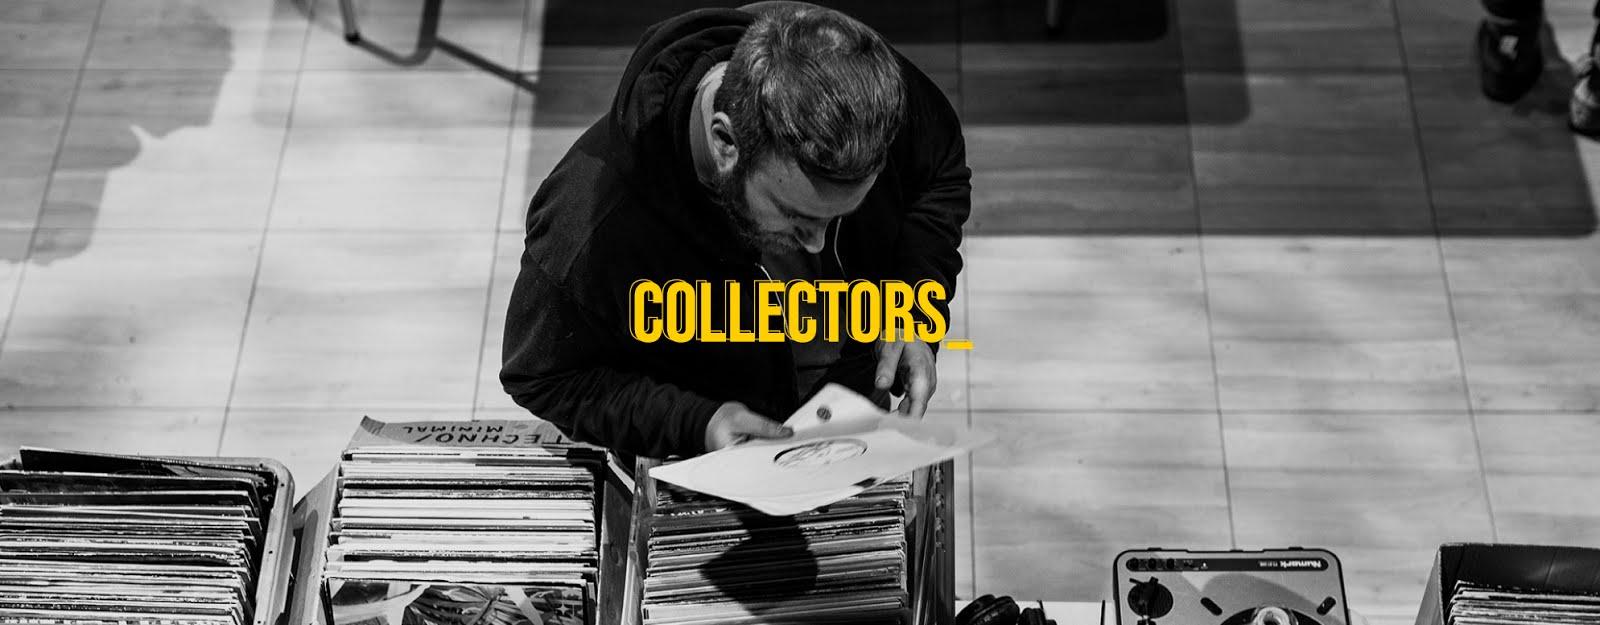 COLLECTORS_